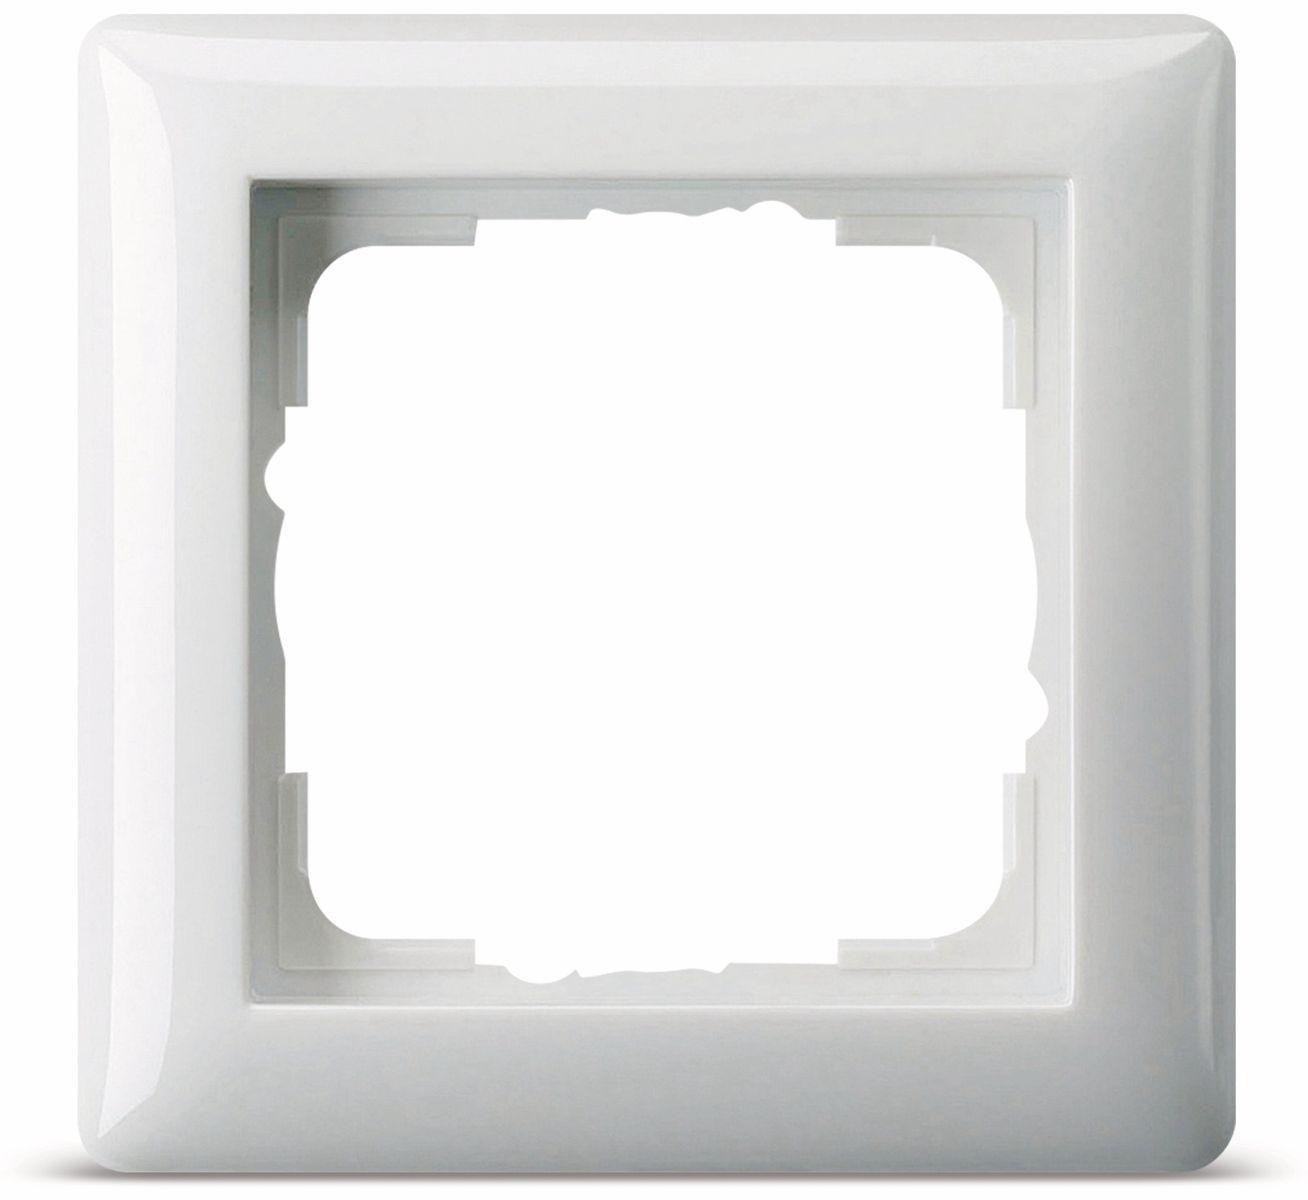 abdeckrahmen 1 fach gira standard 55 021103 reinwei. Black Bedroom Furniture Sets. Home Design Ideas